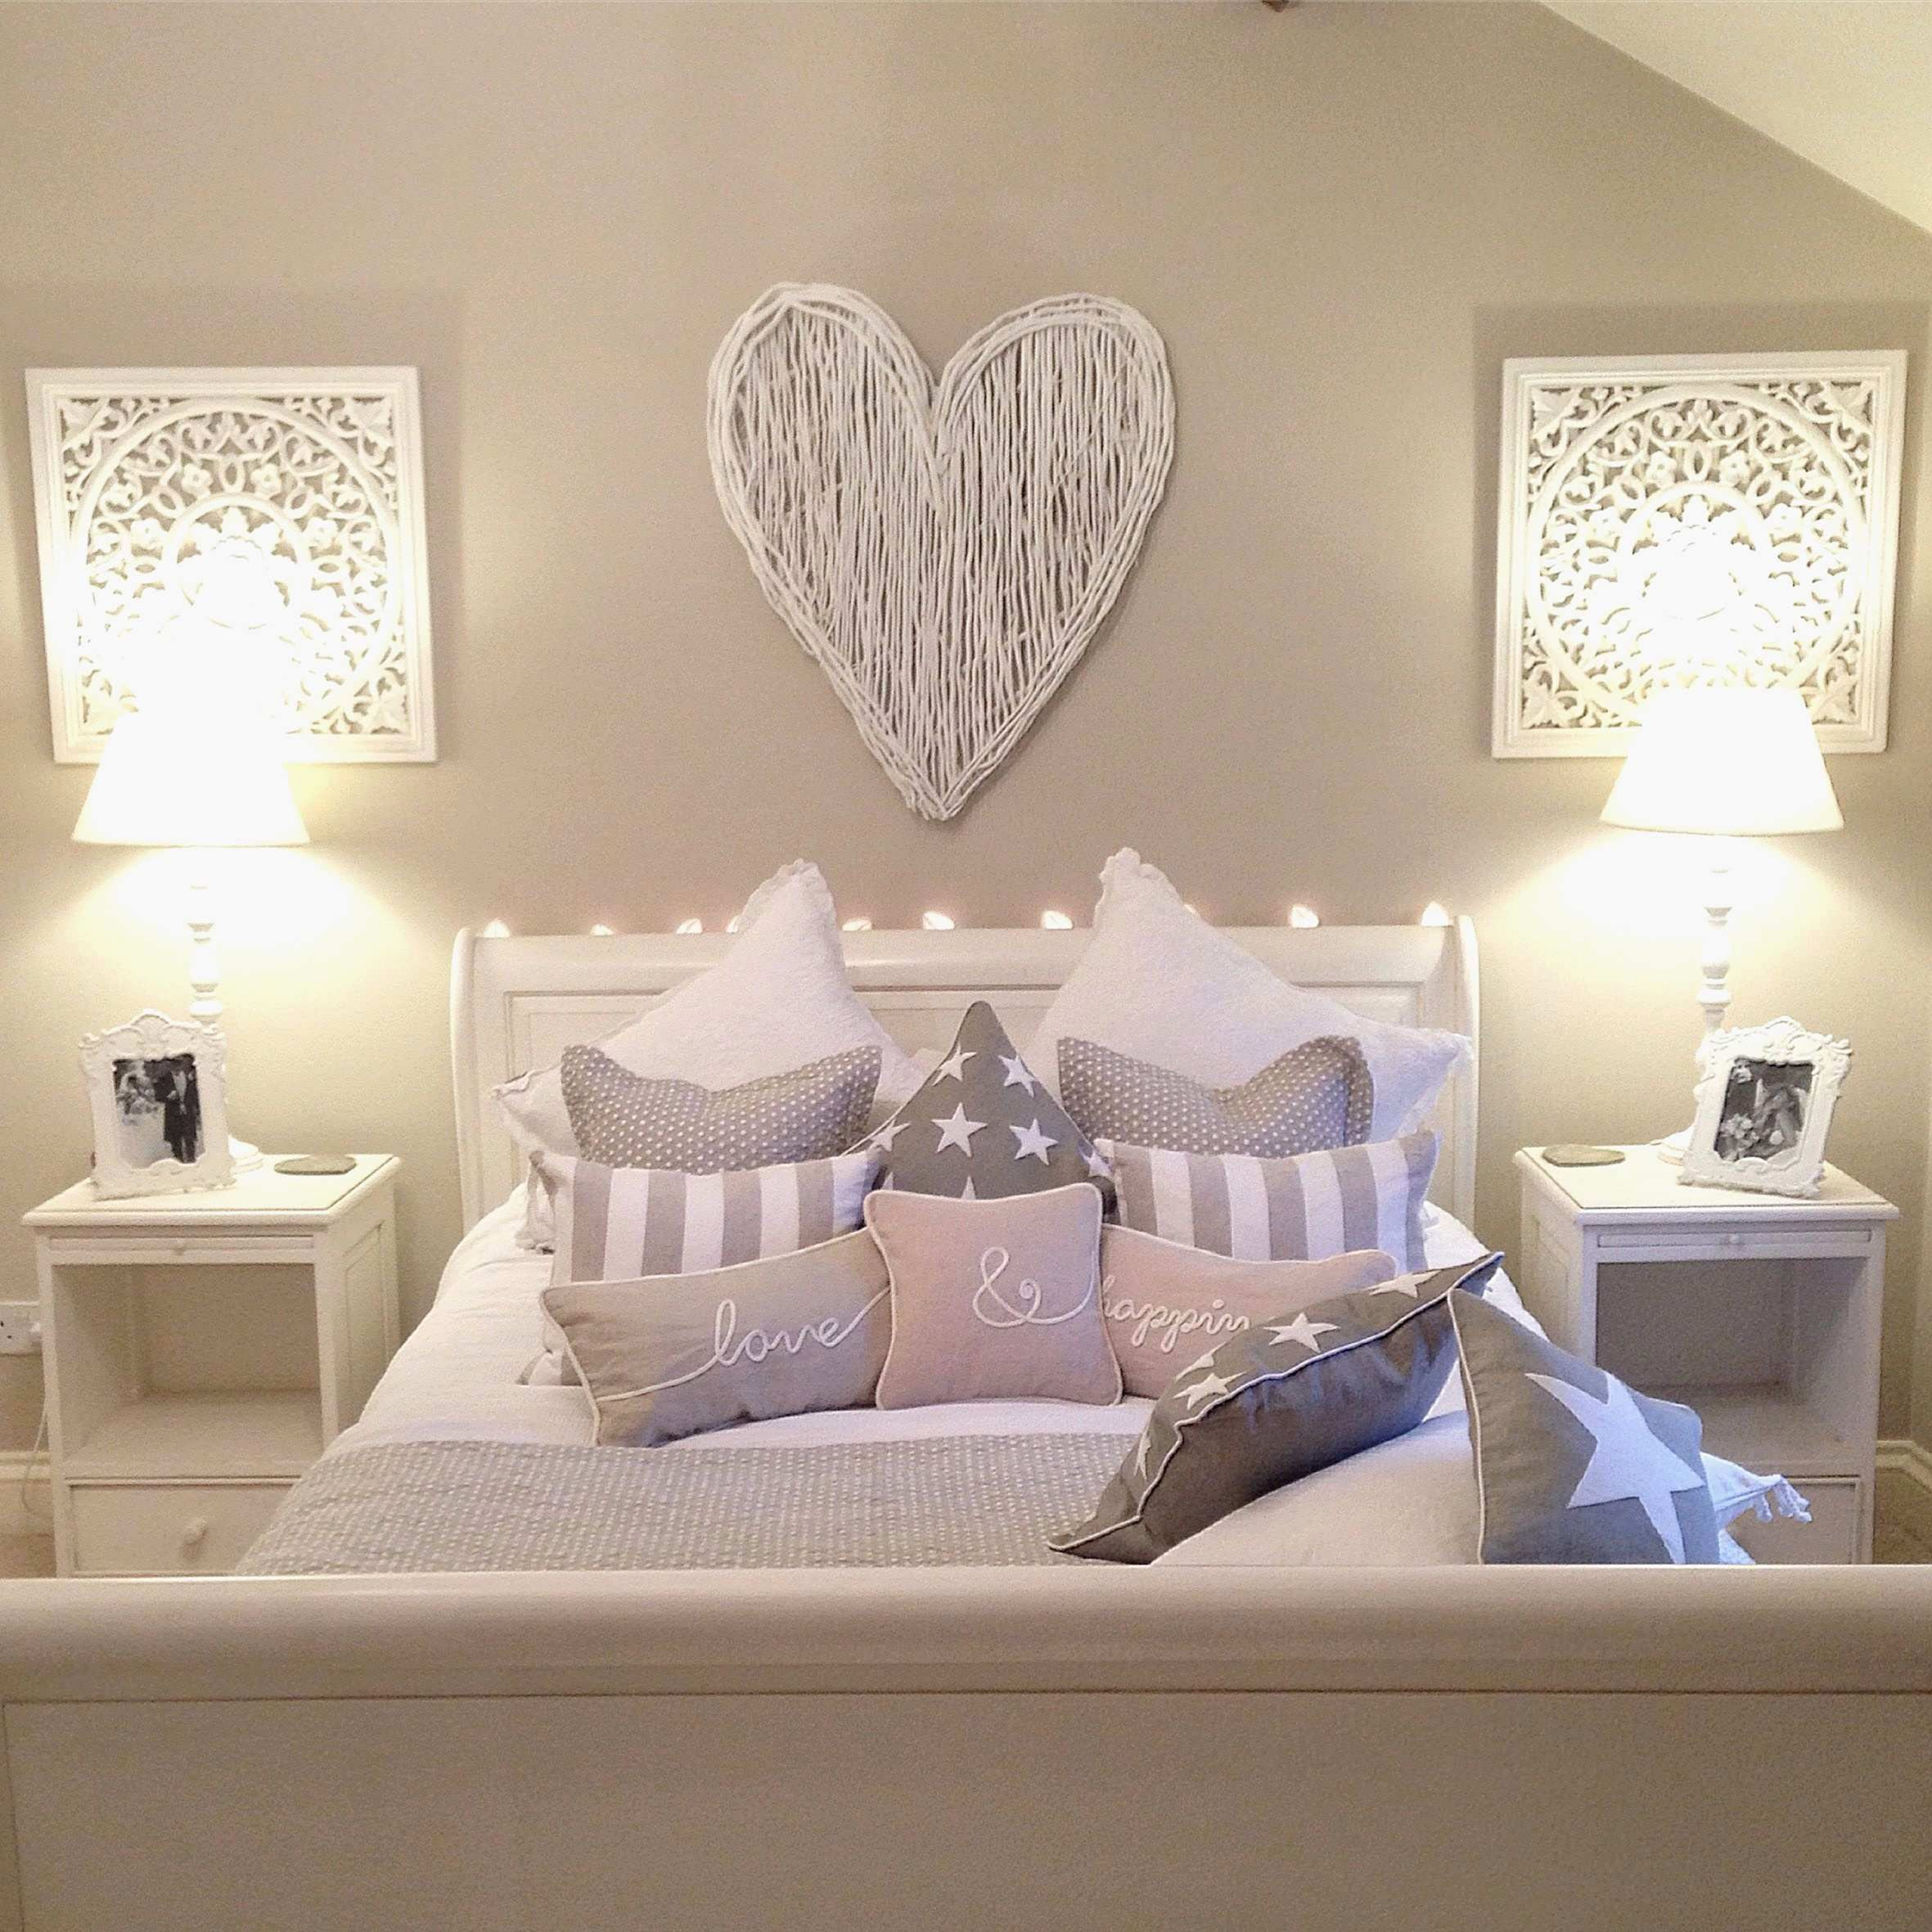 10 Amazing Unique Bedroom Decor Ideas You Must Have In 2020 In 2020 Girl Bedroom Designs Cozy Home Decorating Bedroom Decor